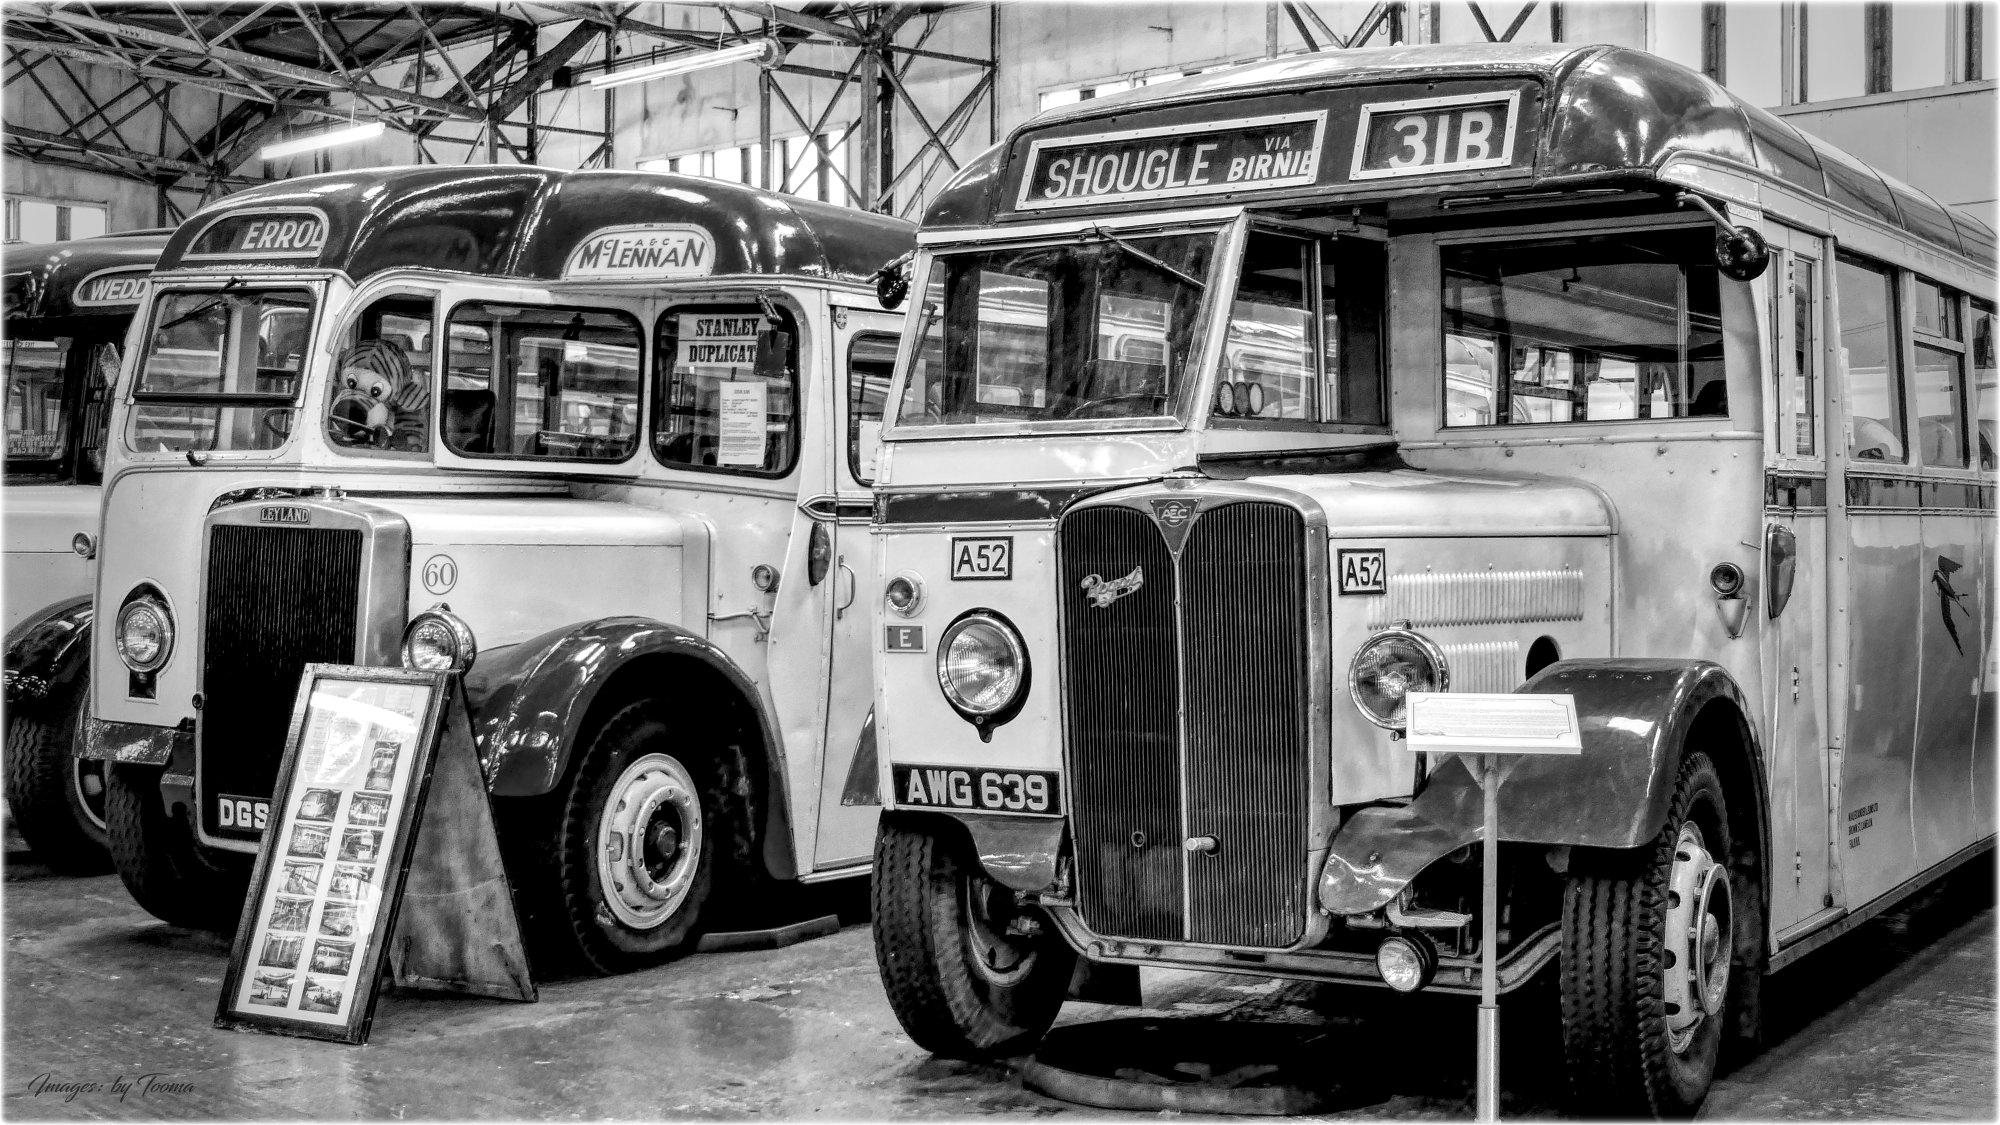 The Shougle Bus.